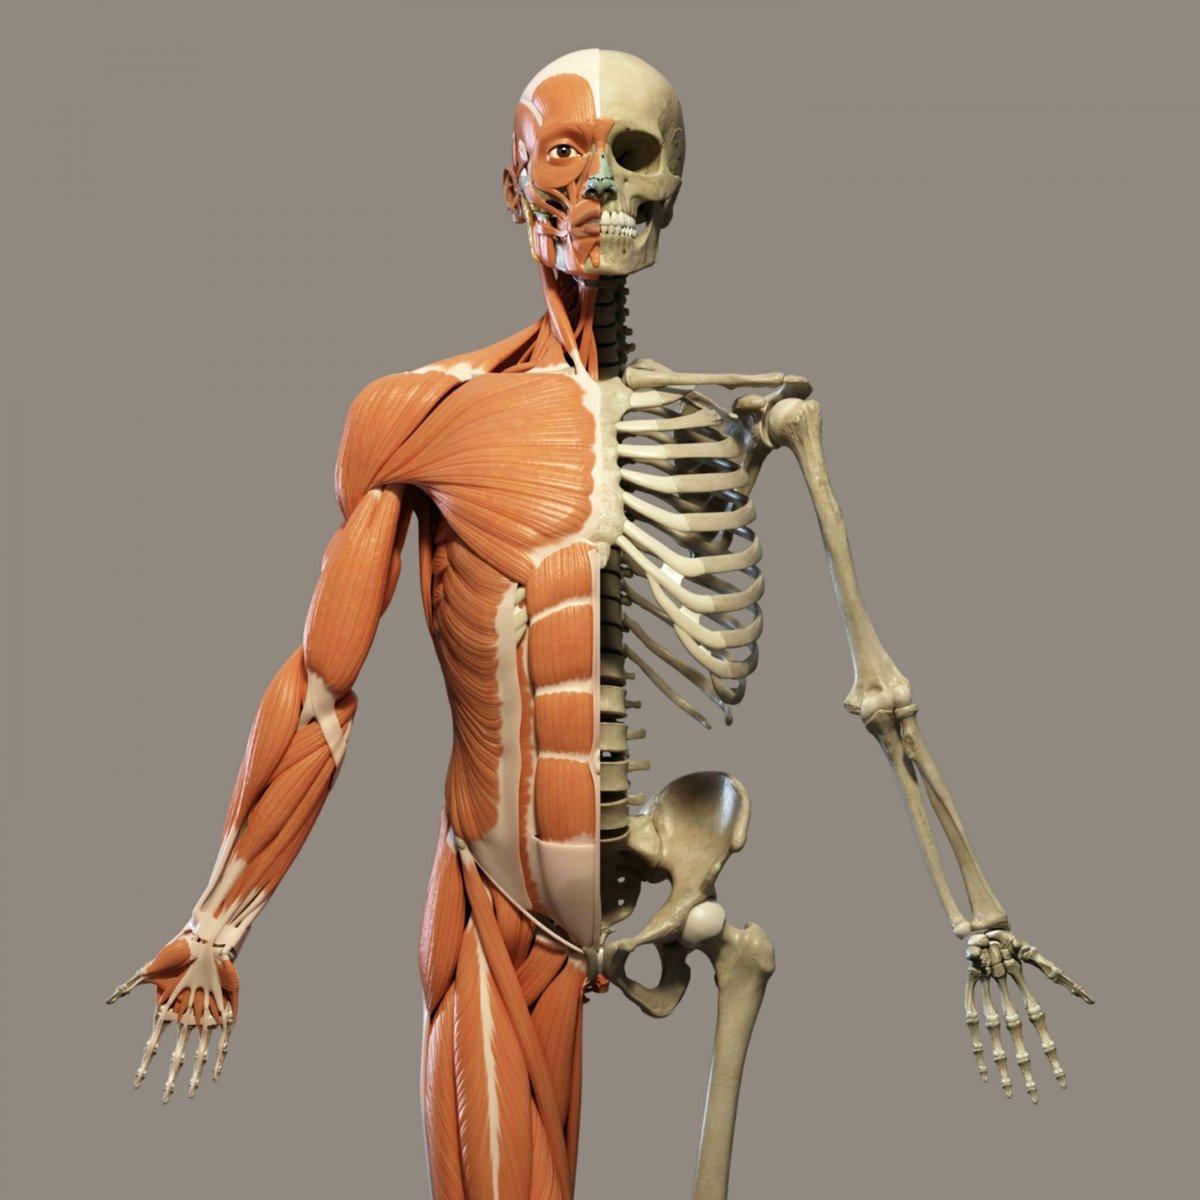 человек скелетов картинки районе озера обустроена